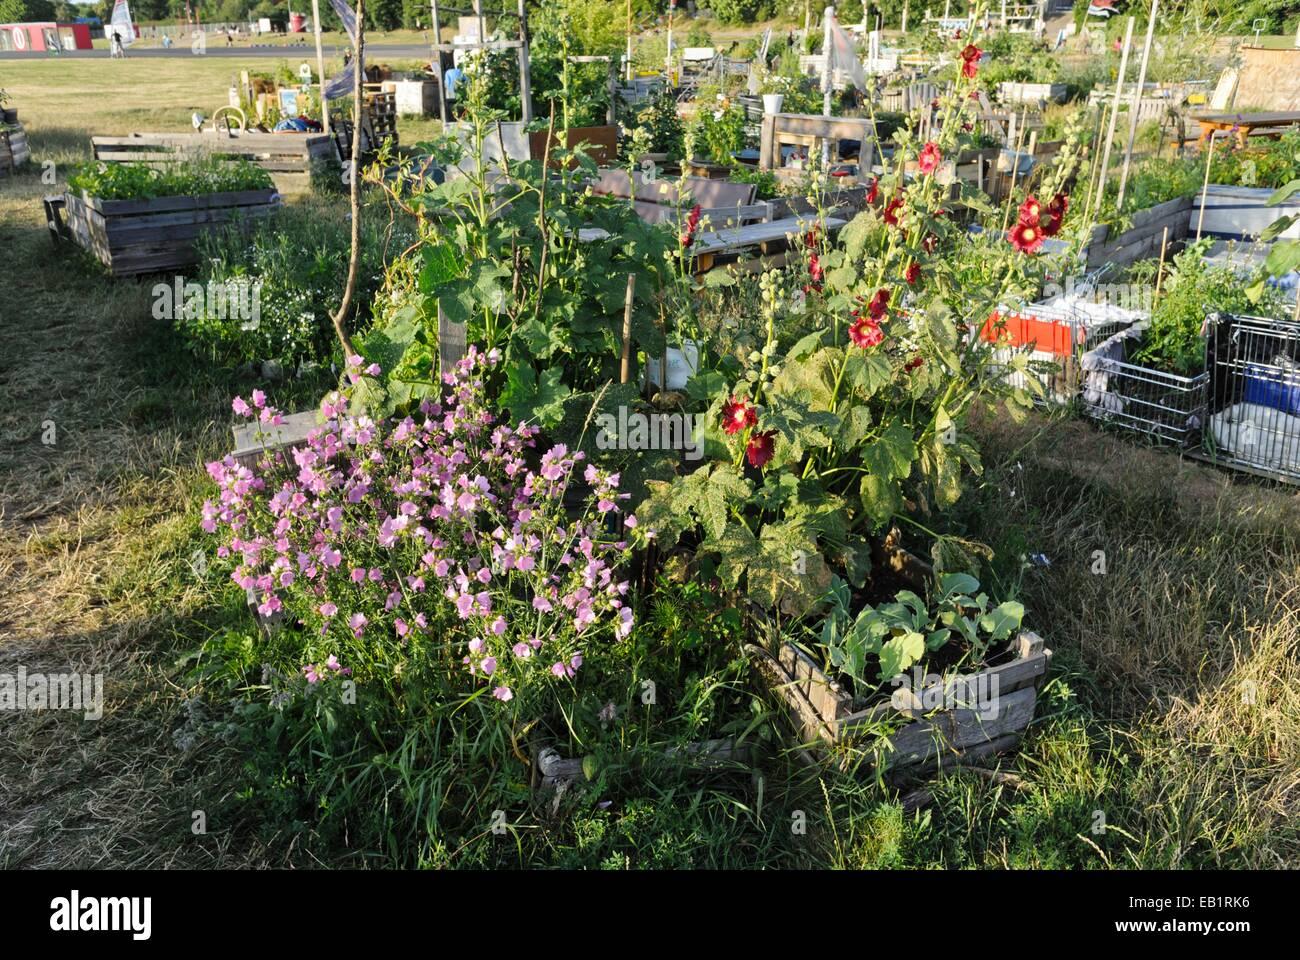 Raised beds in a community garden, Tempelhofer Freiheit, Berlin, Germany - Stock Image